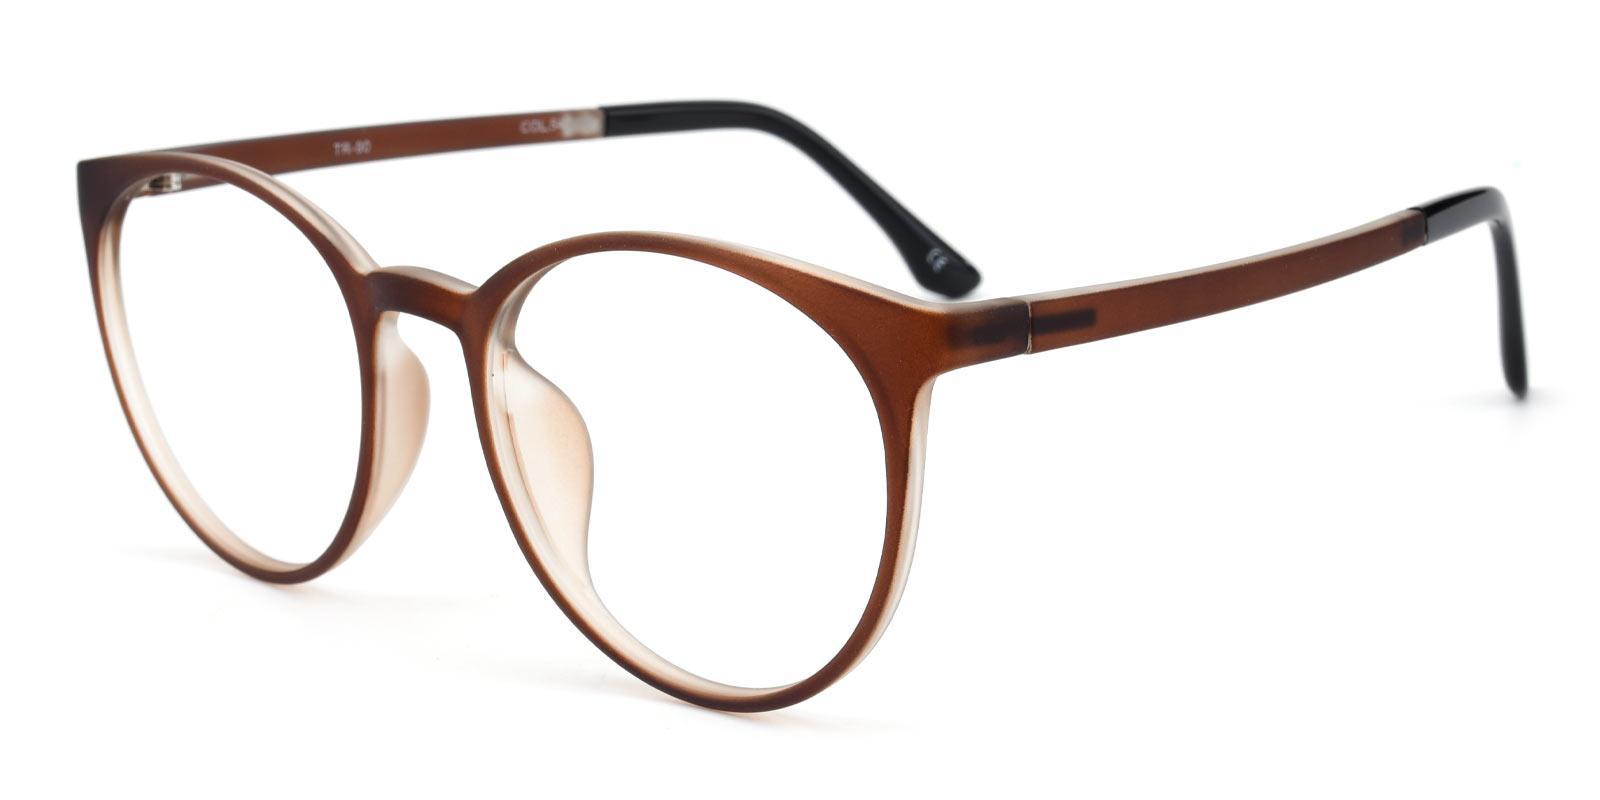 Breenda-Brown-Round-TR-Eyeglasses-additional1